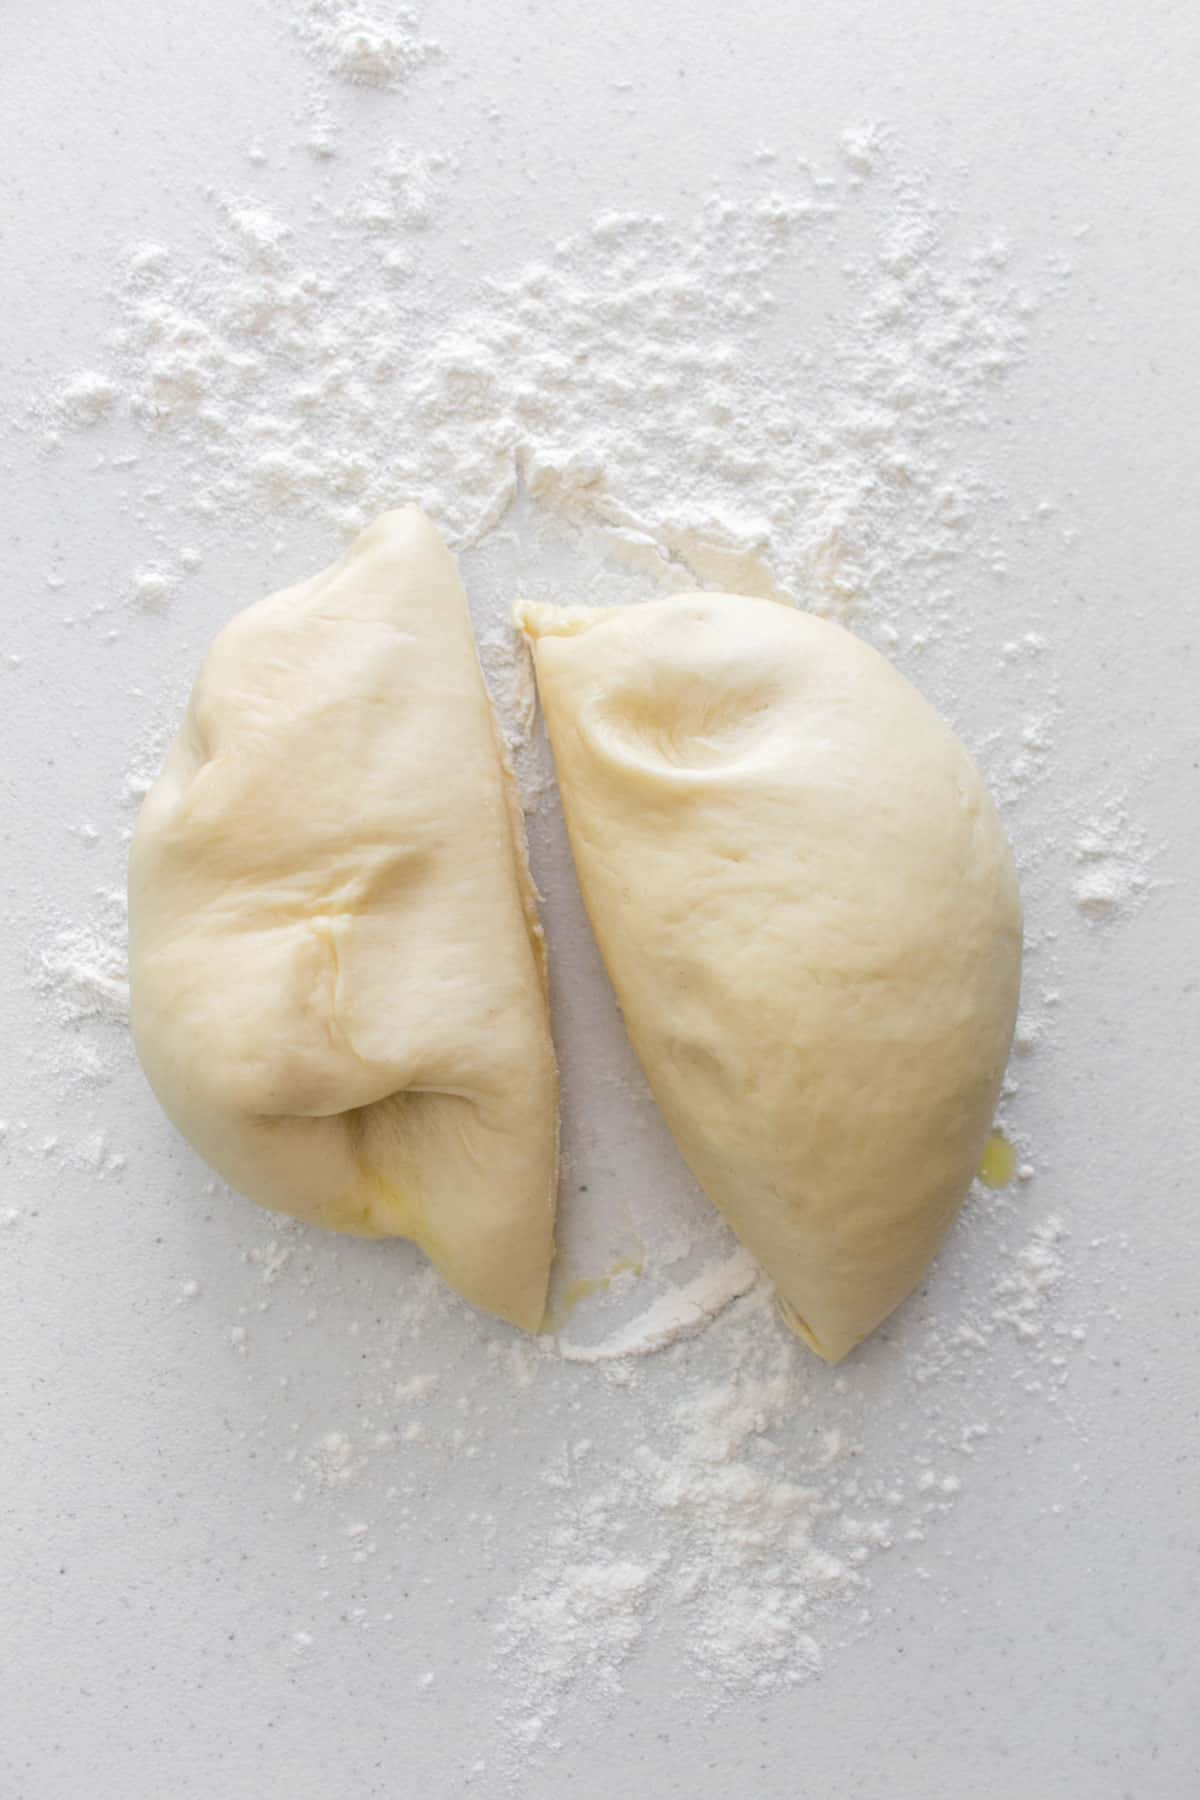 Milk bread dough cut in half.